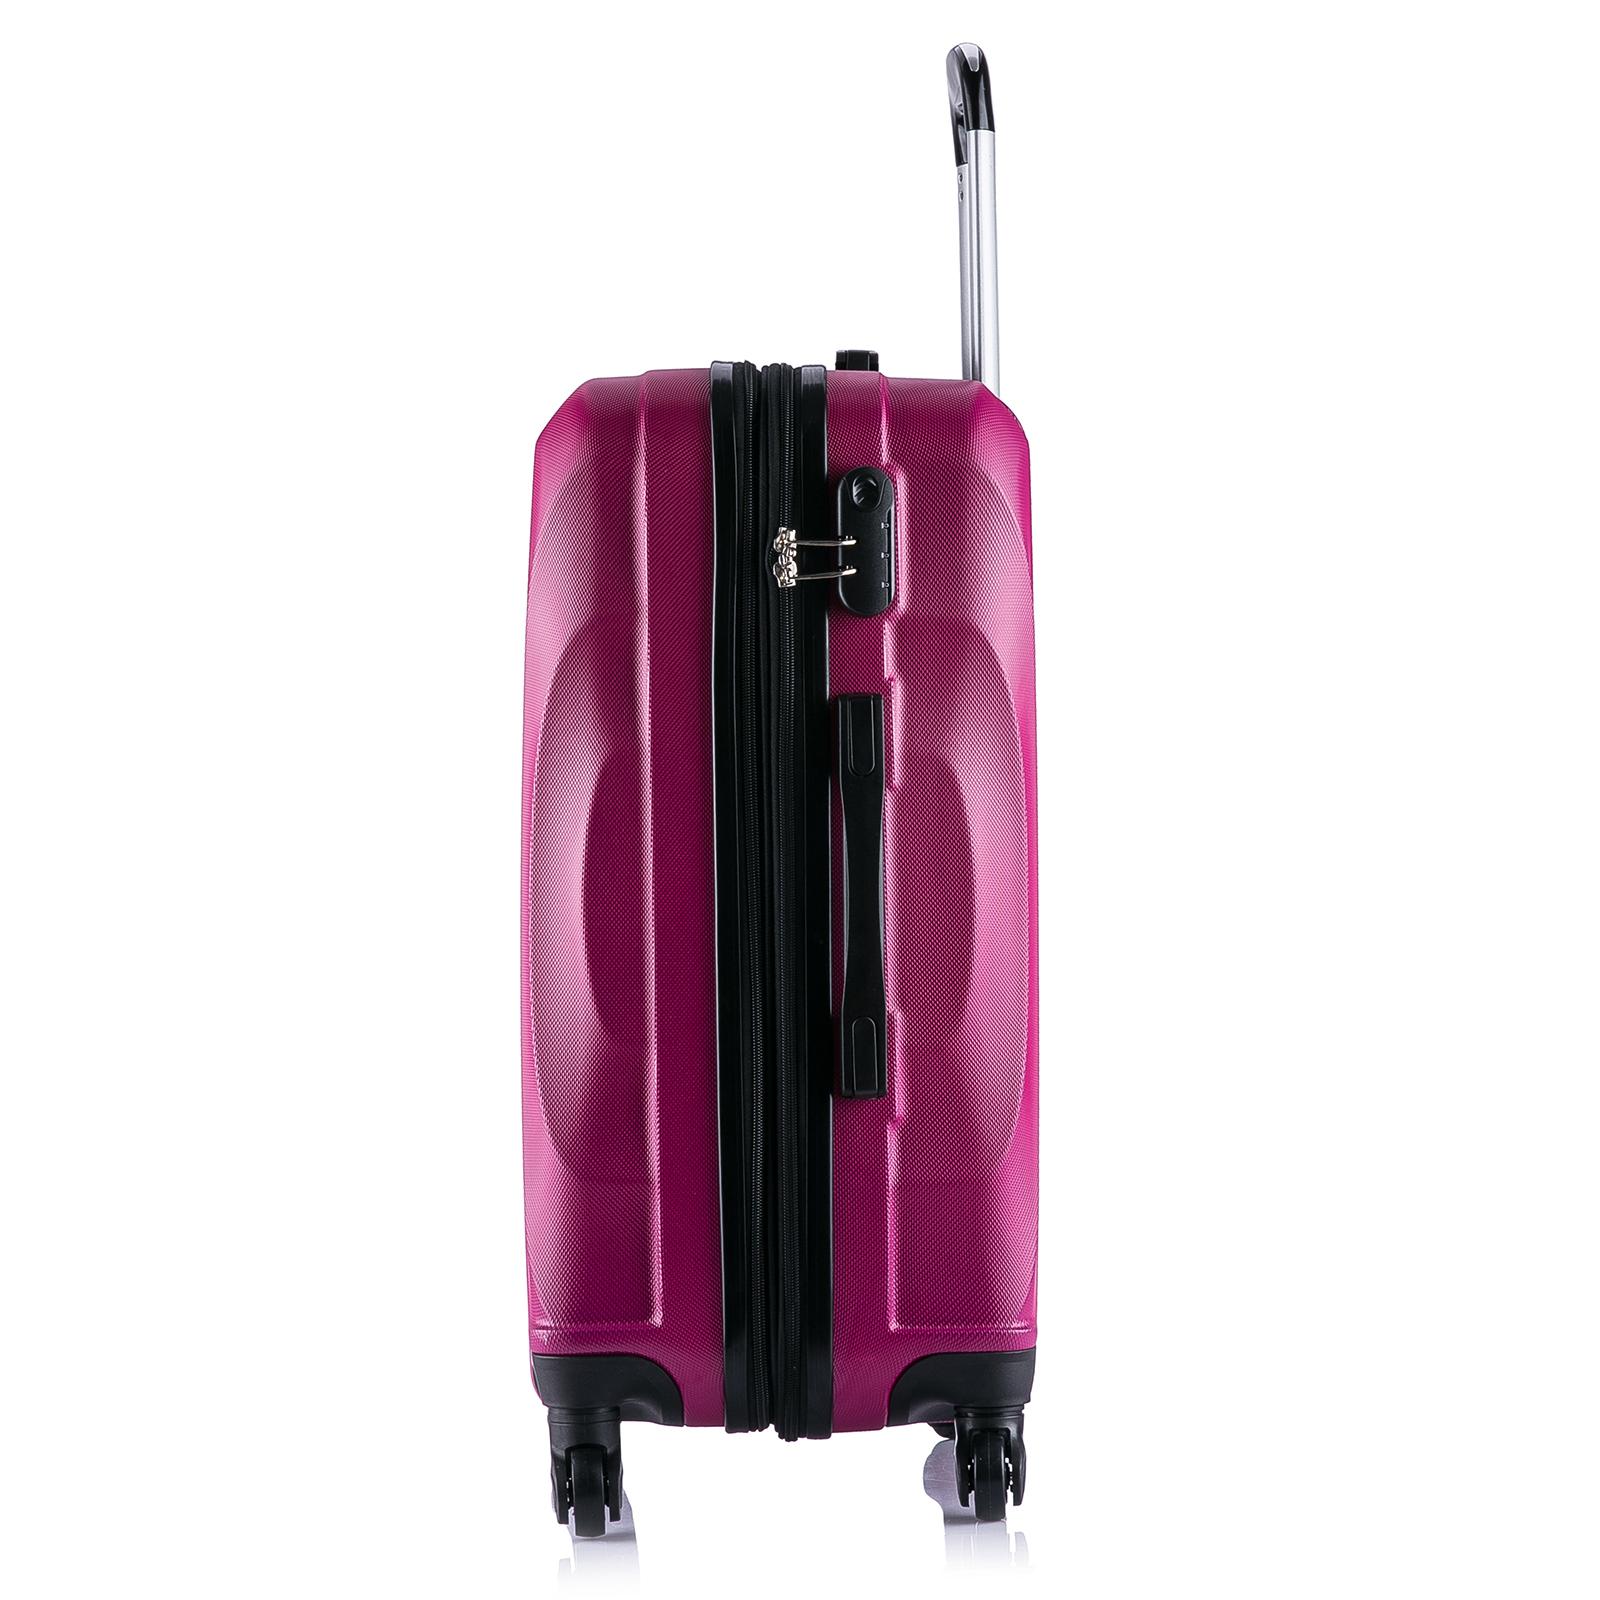 koffer trolley reisekoffer hartschalenkoffer handgep ck l. Black Bedroom Furniture Sets. Home Design Ideas